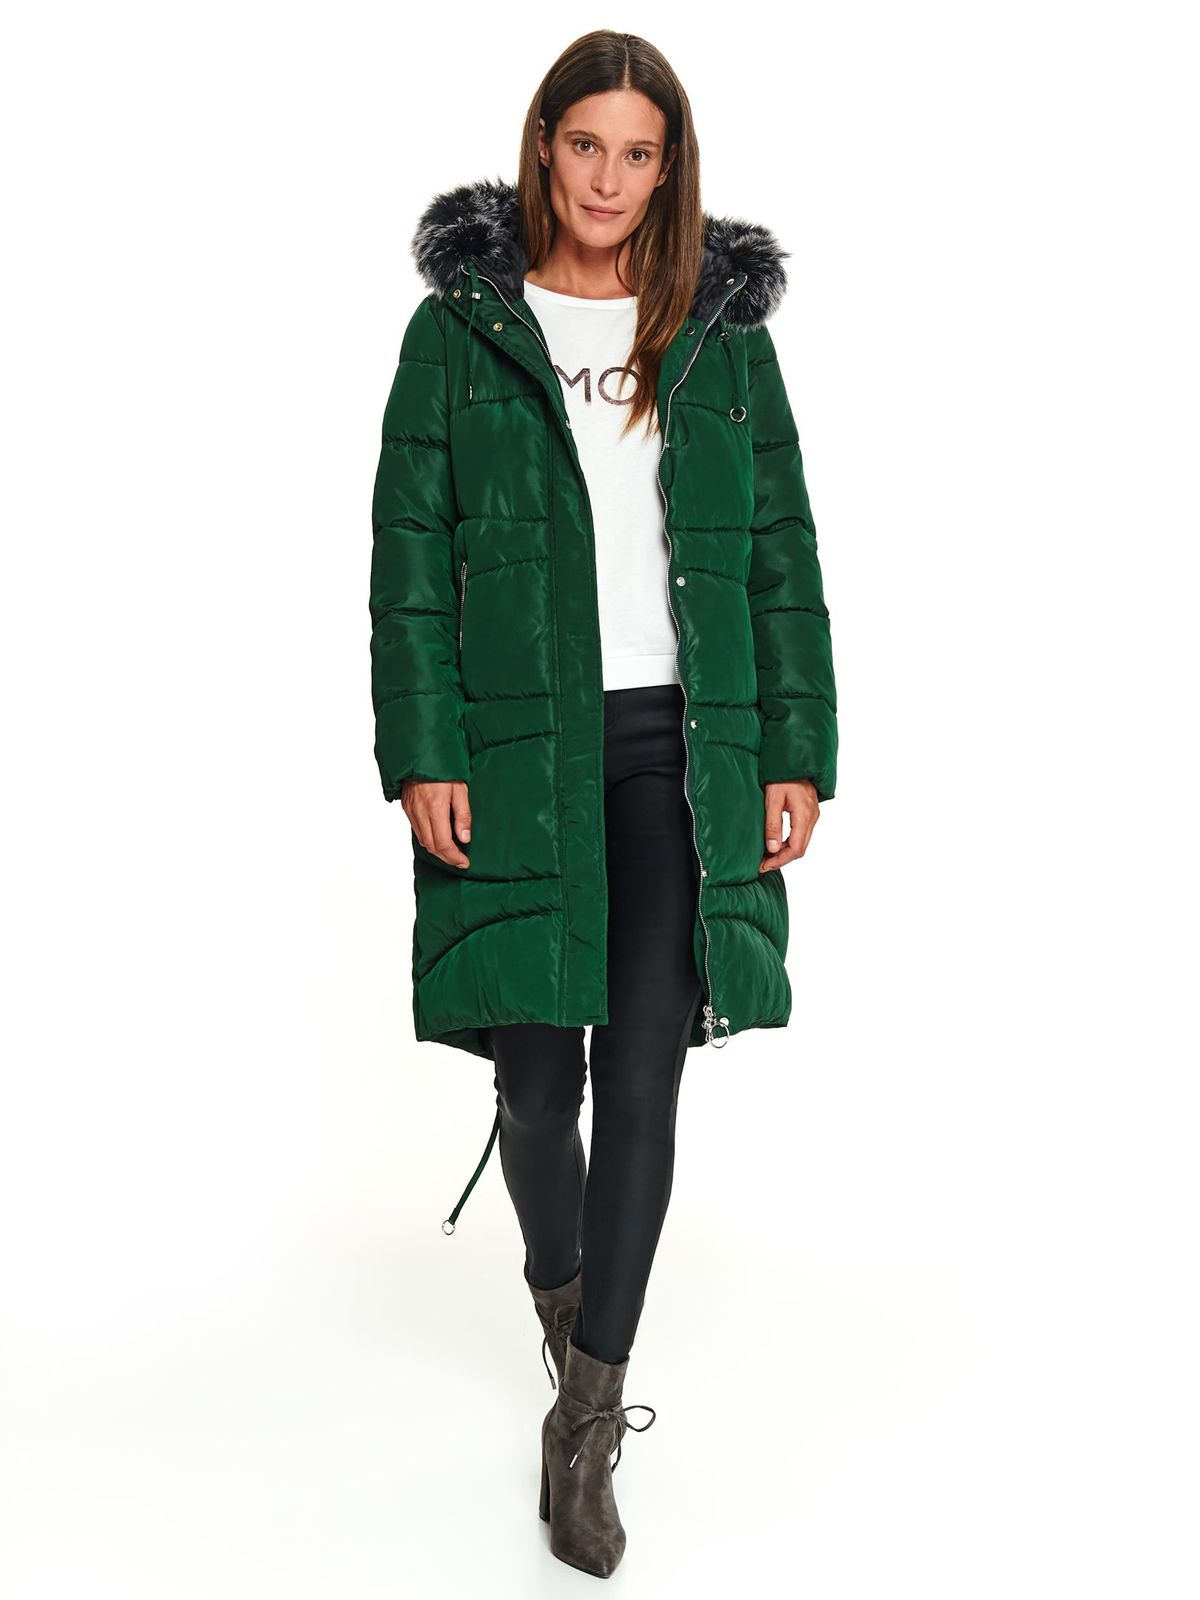 Darkgreen jacket casual midi the jacket has hood and pockets